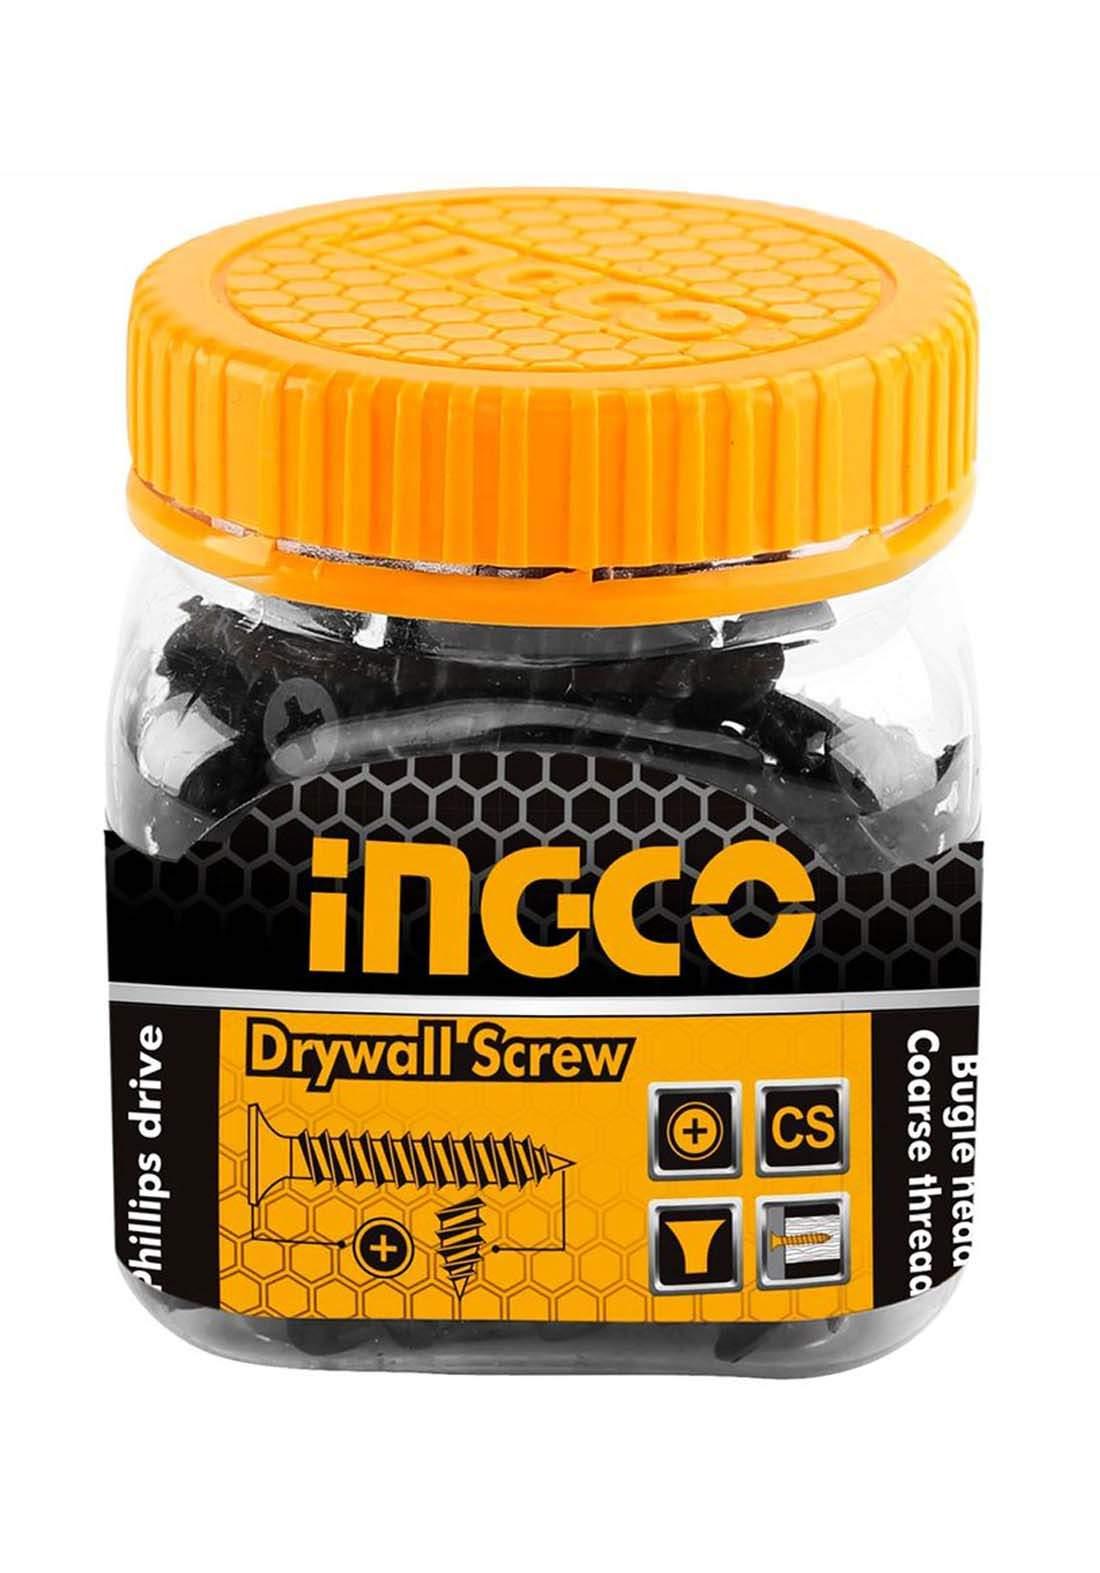 Ingco HWDS3503221 Drywall screw ST3.5 * 32 mm علبة براغي